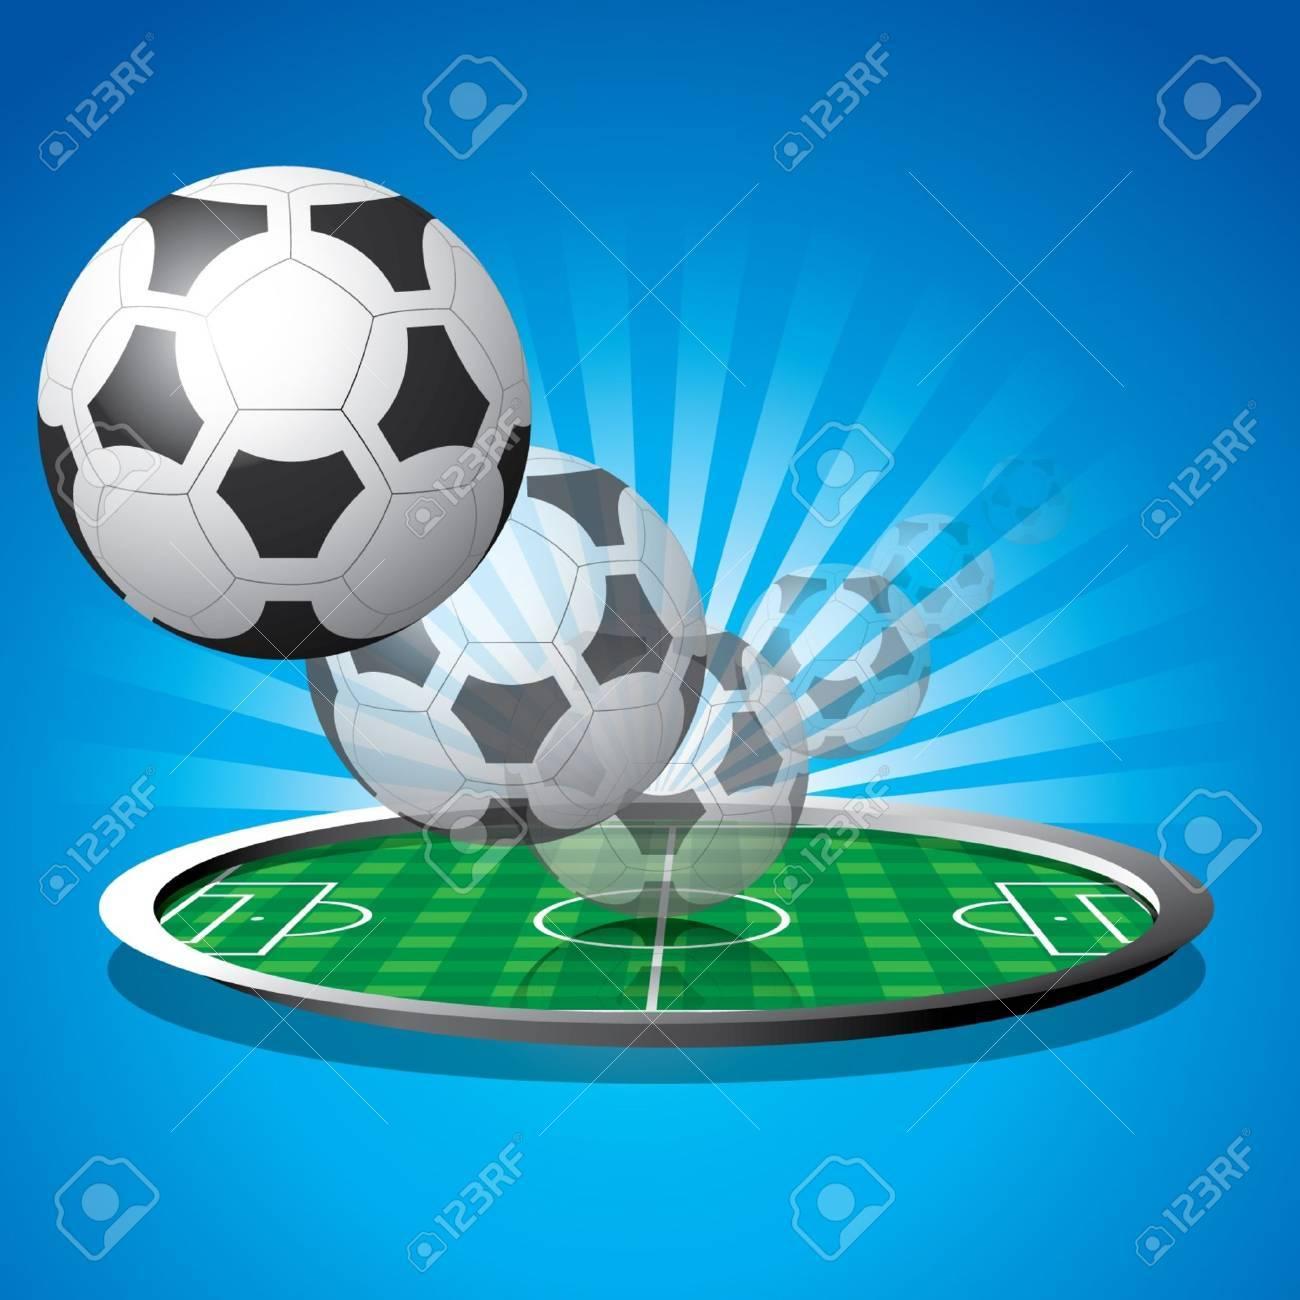 Soccer Football ready to serve Stock Vector - 14072337